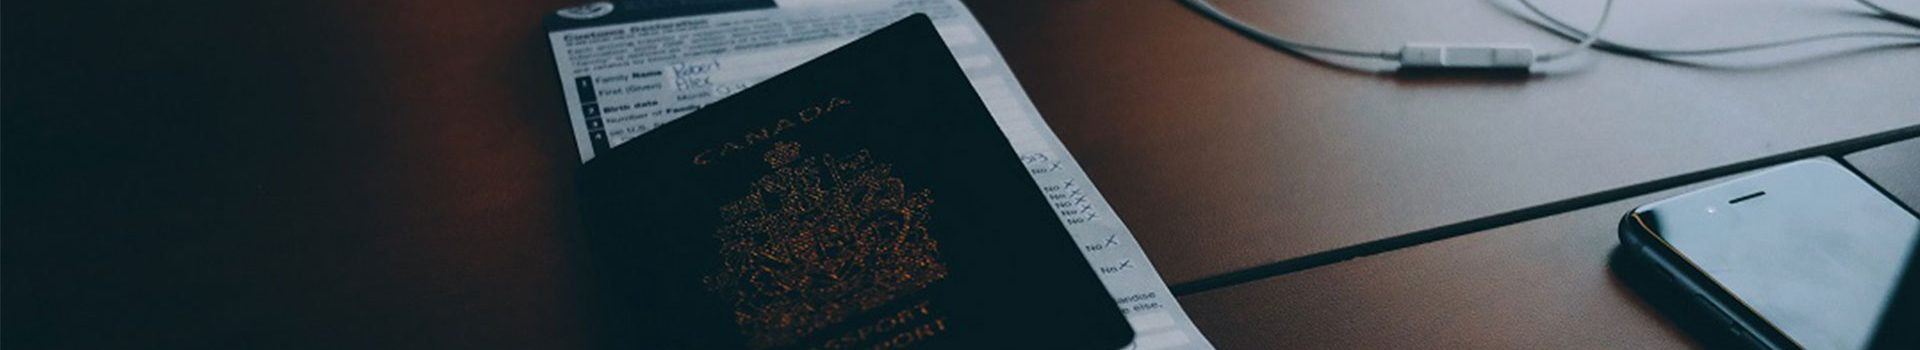 وقت سفارت کانادا | وقت سفارت کانادا | ویزای کانادا | وقت سفارت کانادا در استانبول و دبی ۶۶۵۷۰۴۵۵ – ۶۶۵۷۰۴۵۴ 021